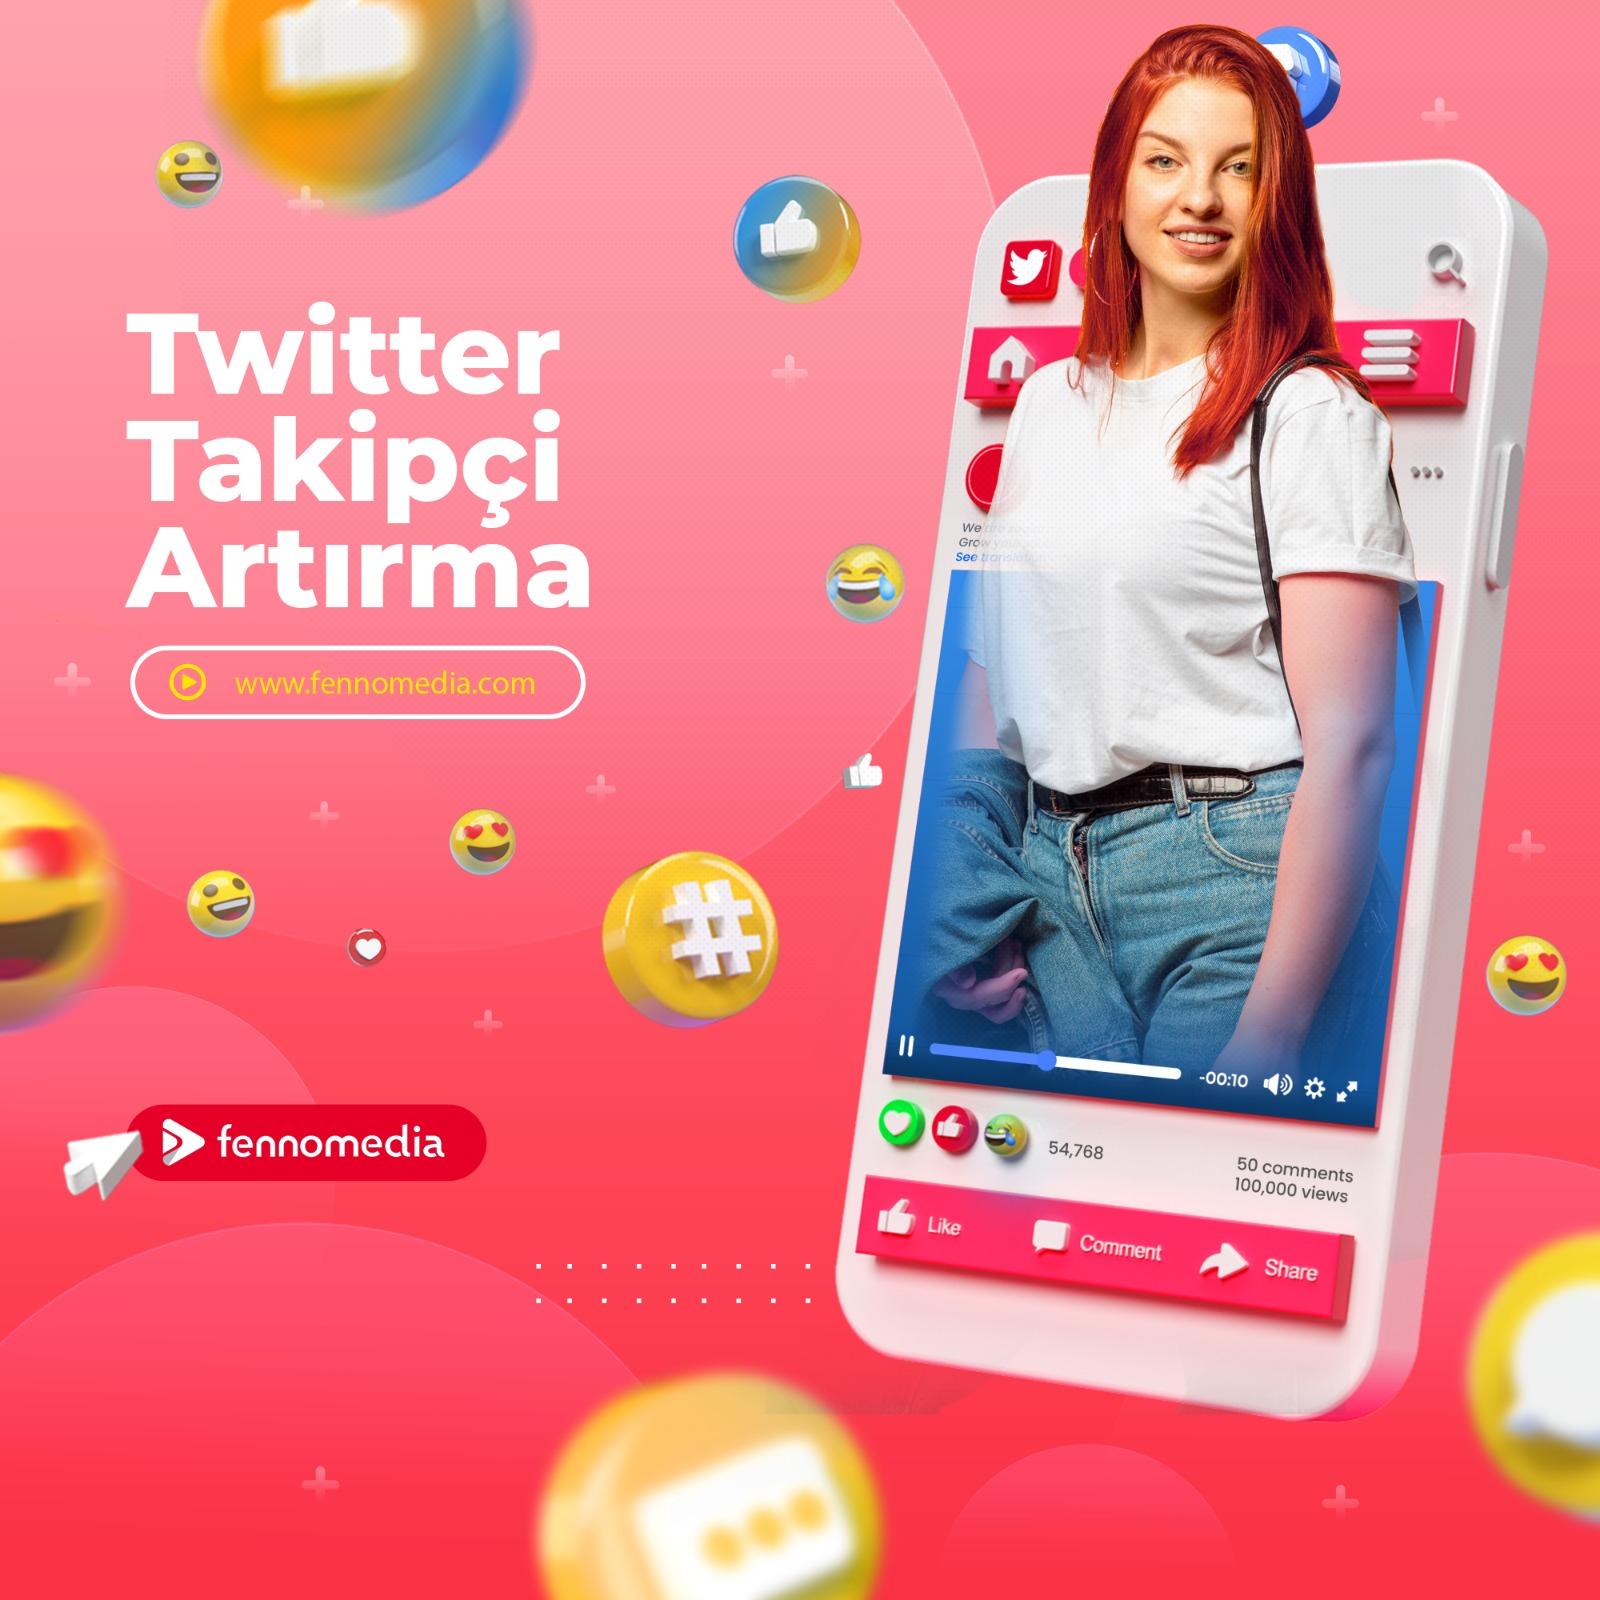 Twitter takipçi artırma